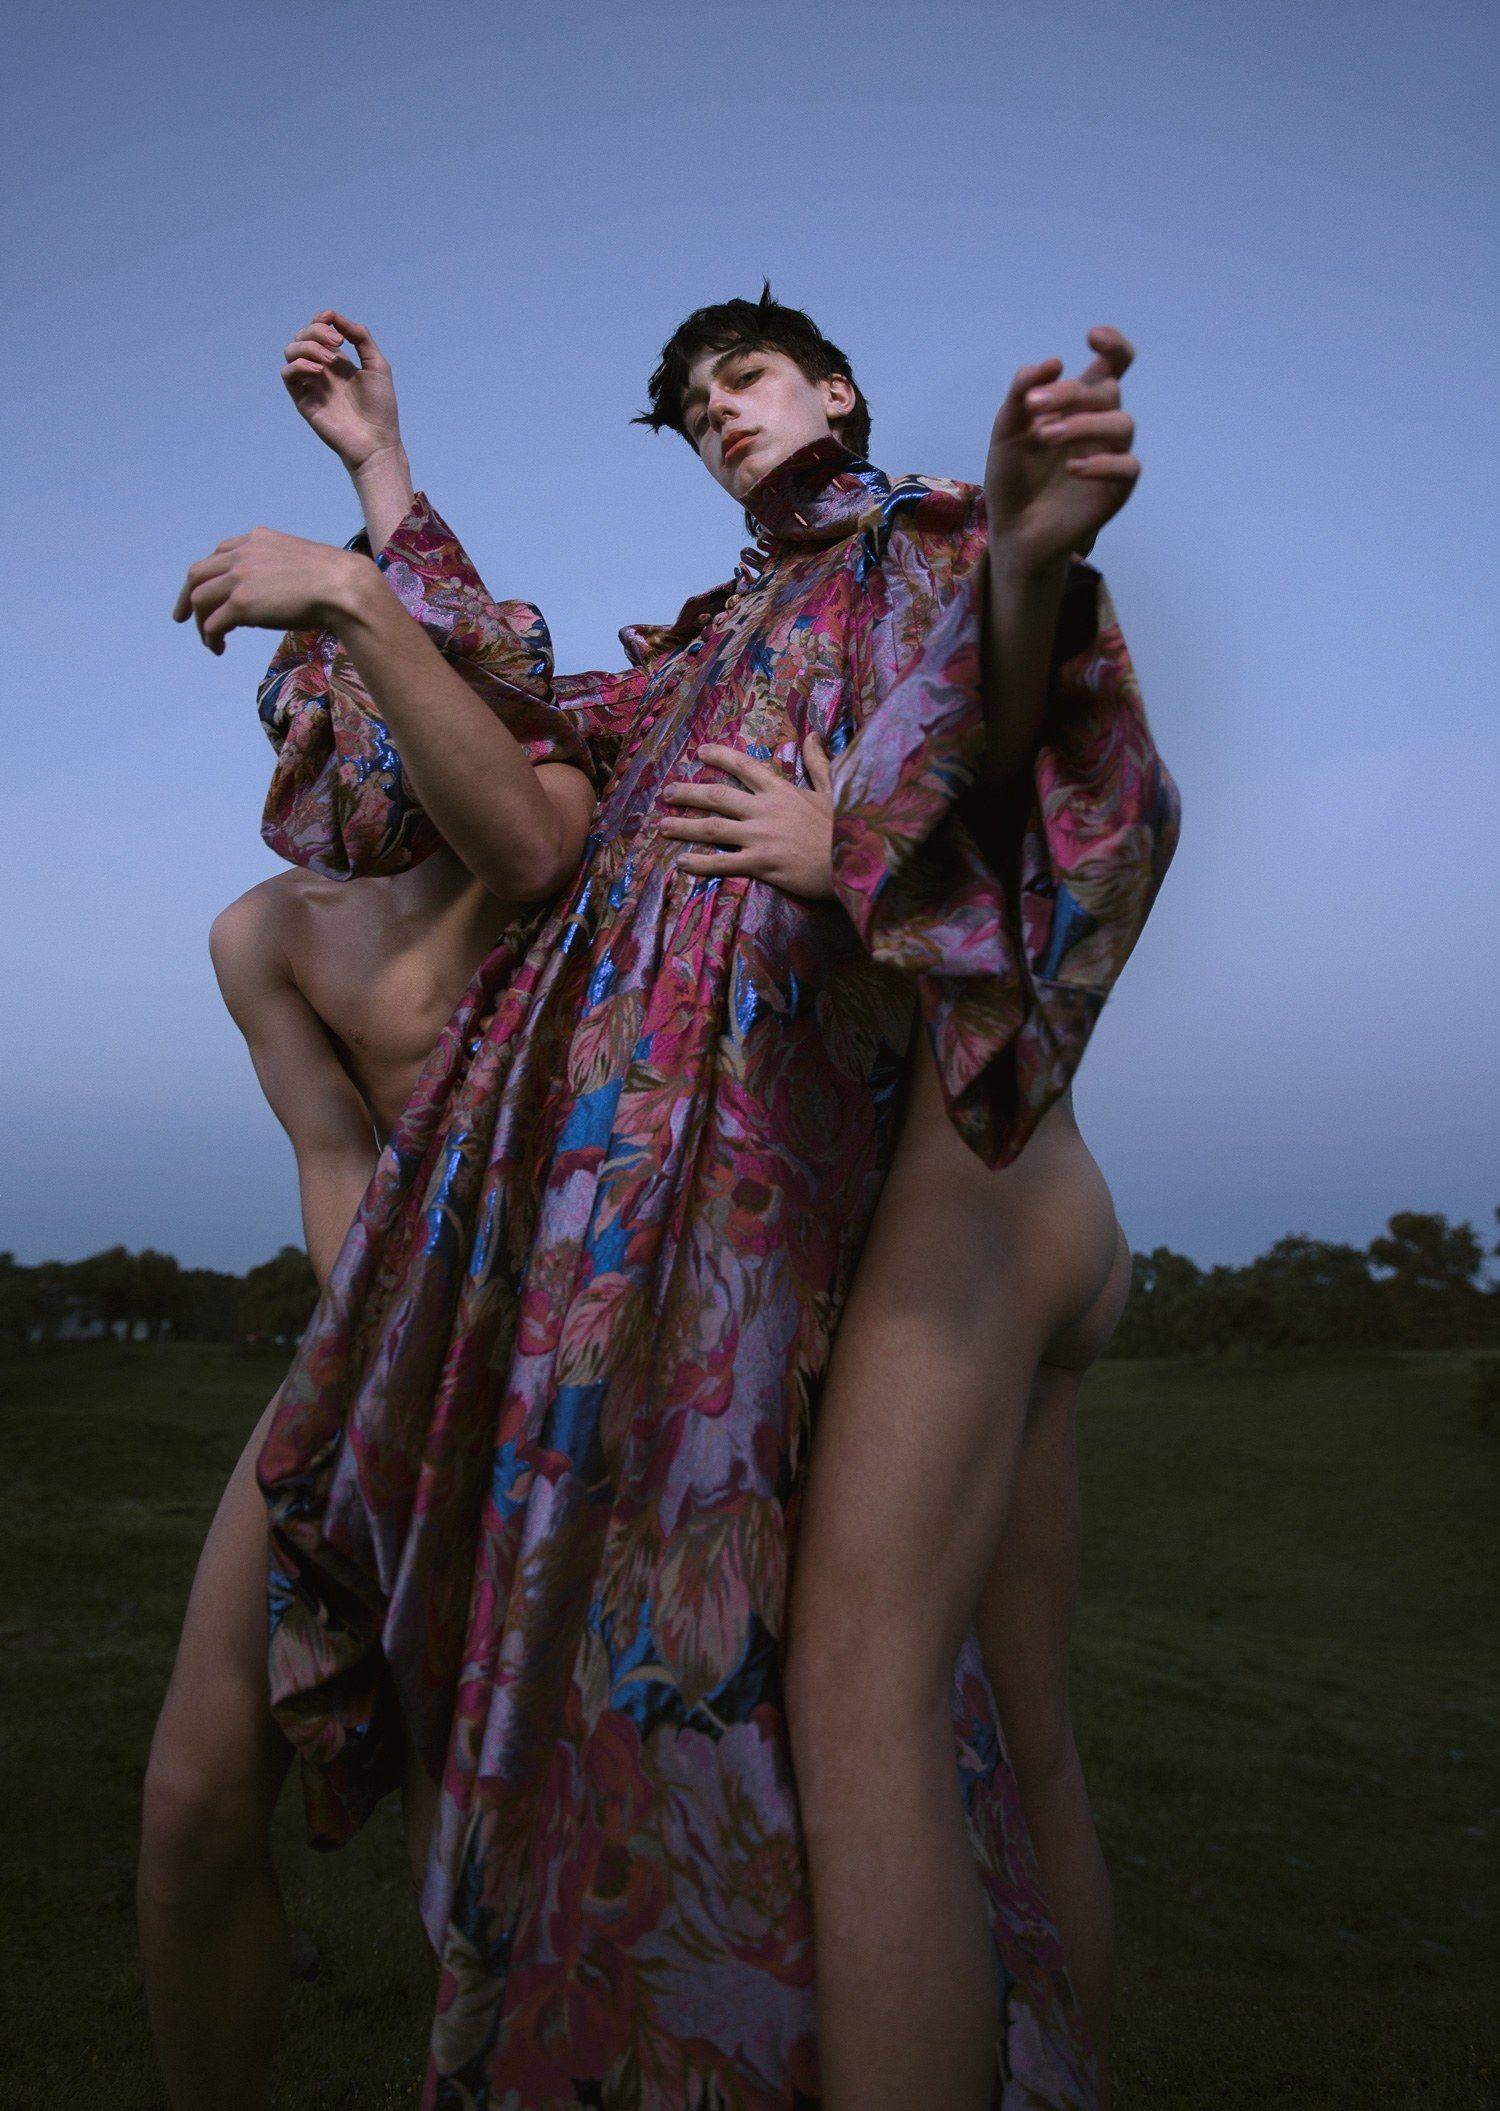 Amy hood naked,Girls of `Survivor's Remorse s01 - 2014 HD 720p Erotic video Valeriya volkova by jean pierrot hq photo shoot,Denise van outen cleavage